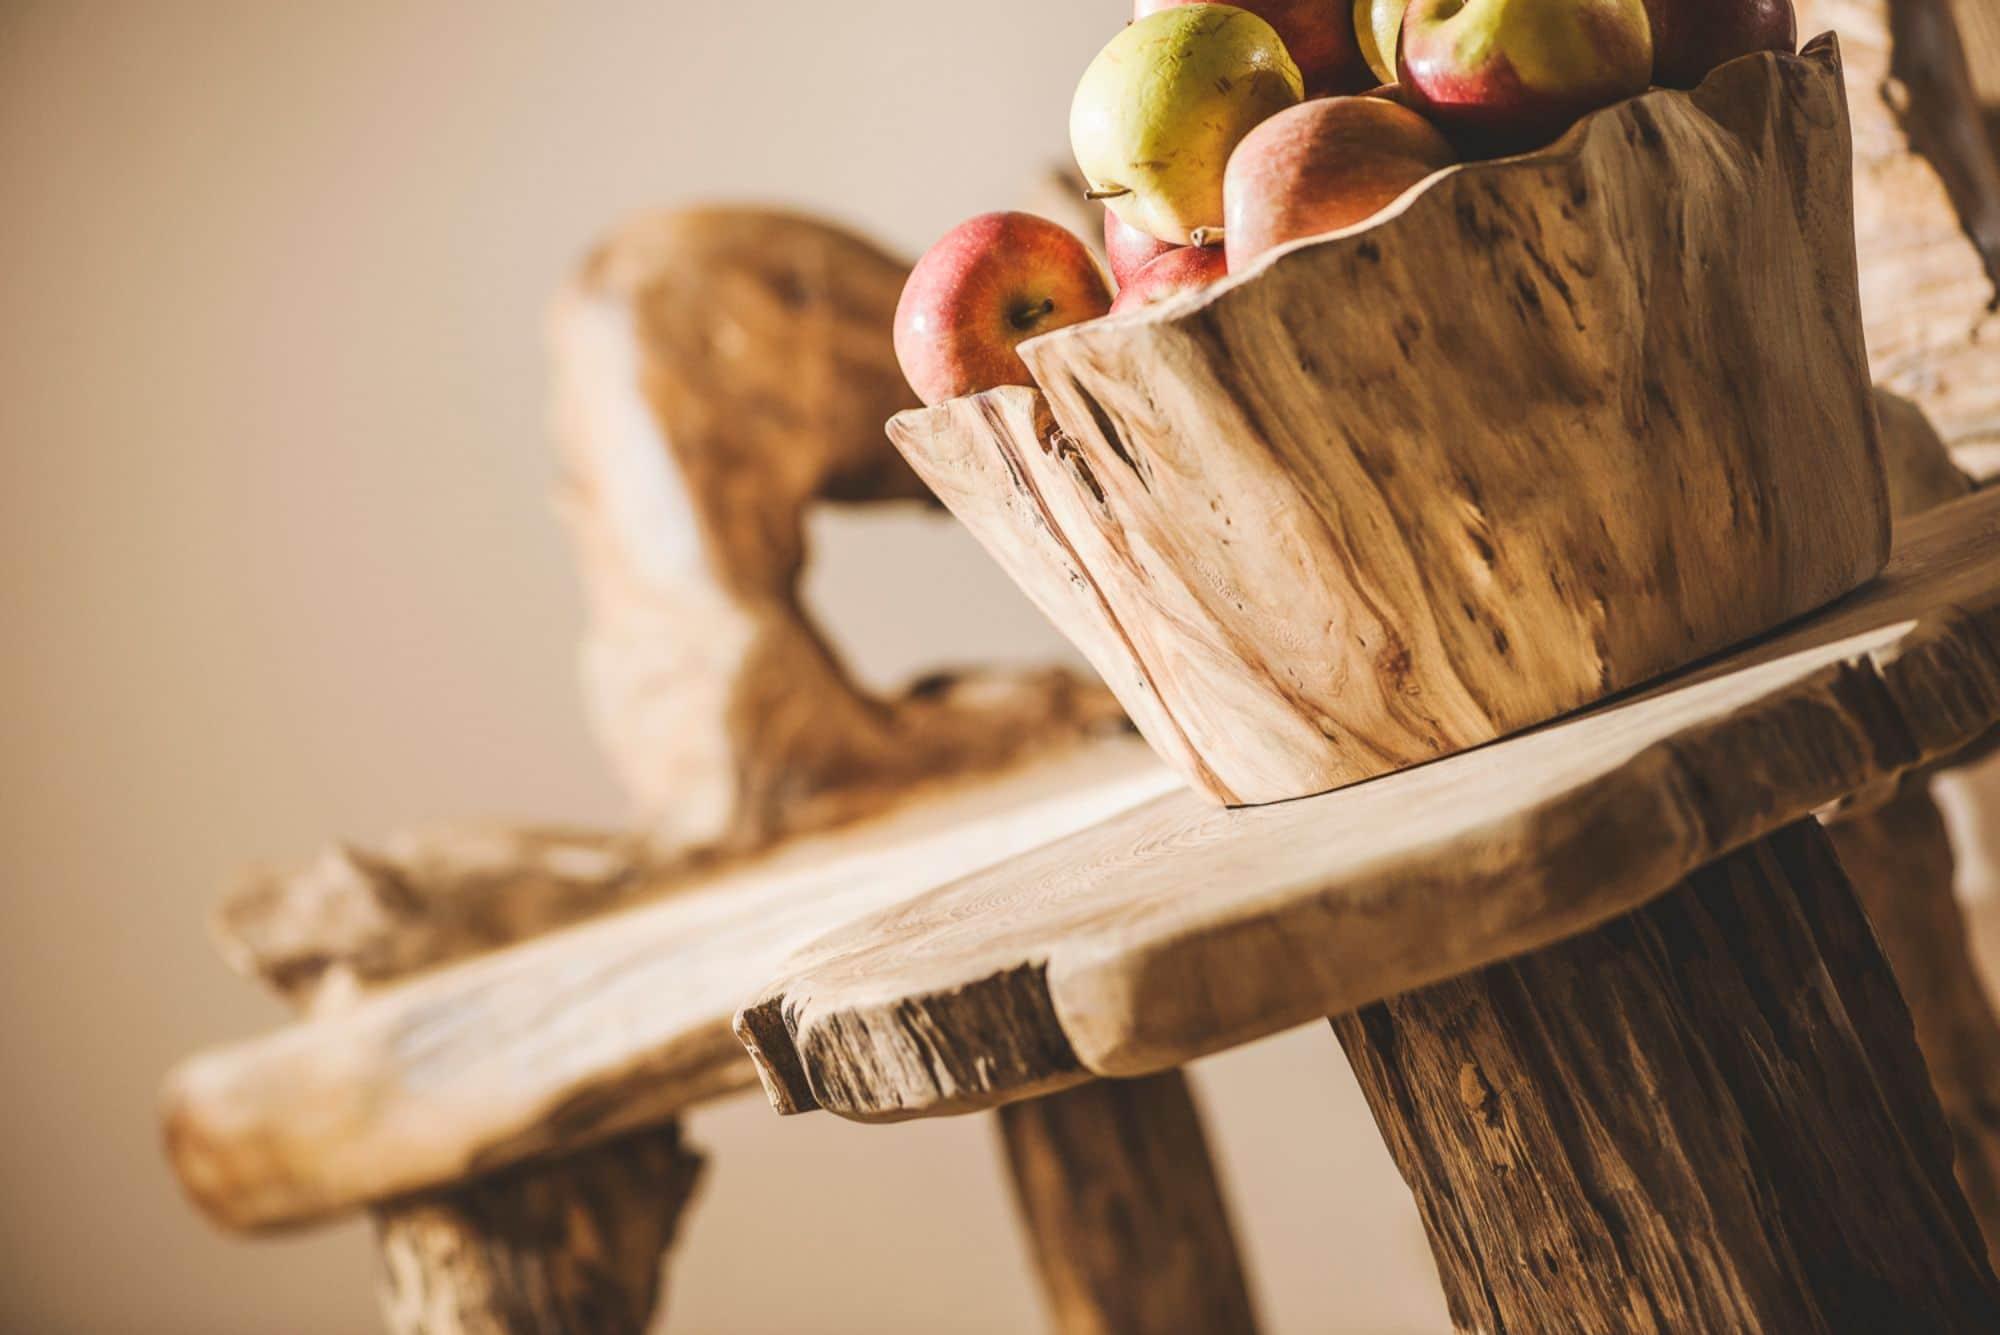 Apfelkorb mit Saftigen Äpfeln